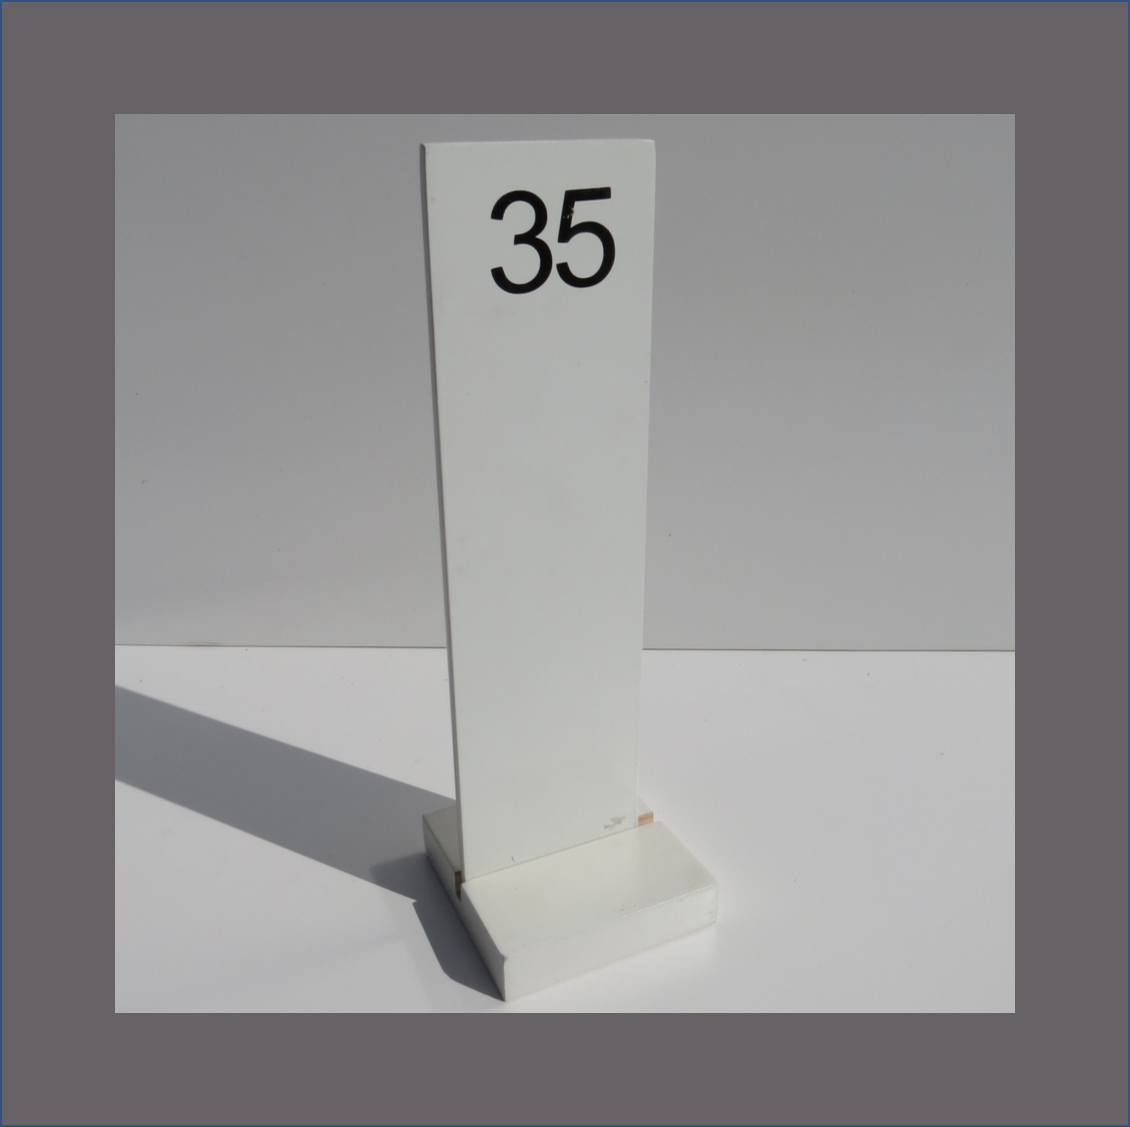 medium-white-with-black-vinyl-table-number